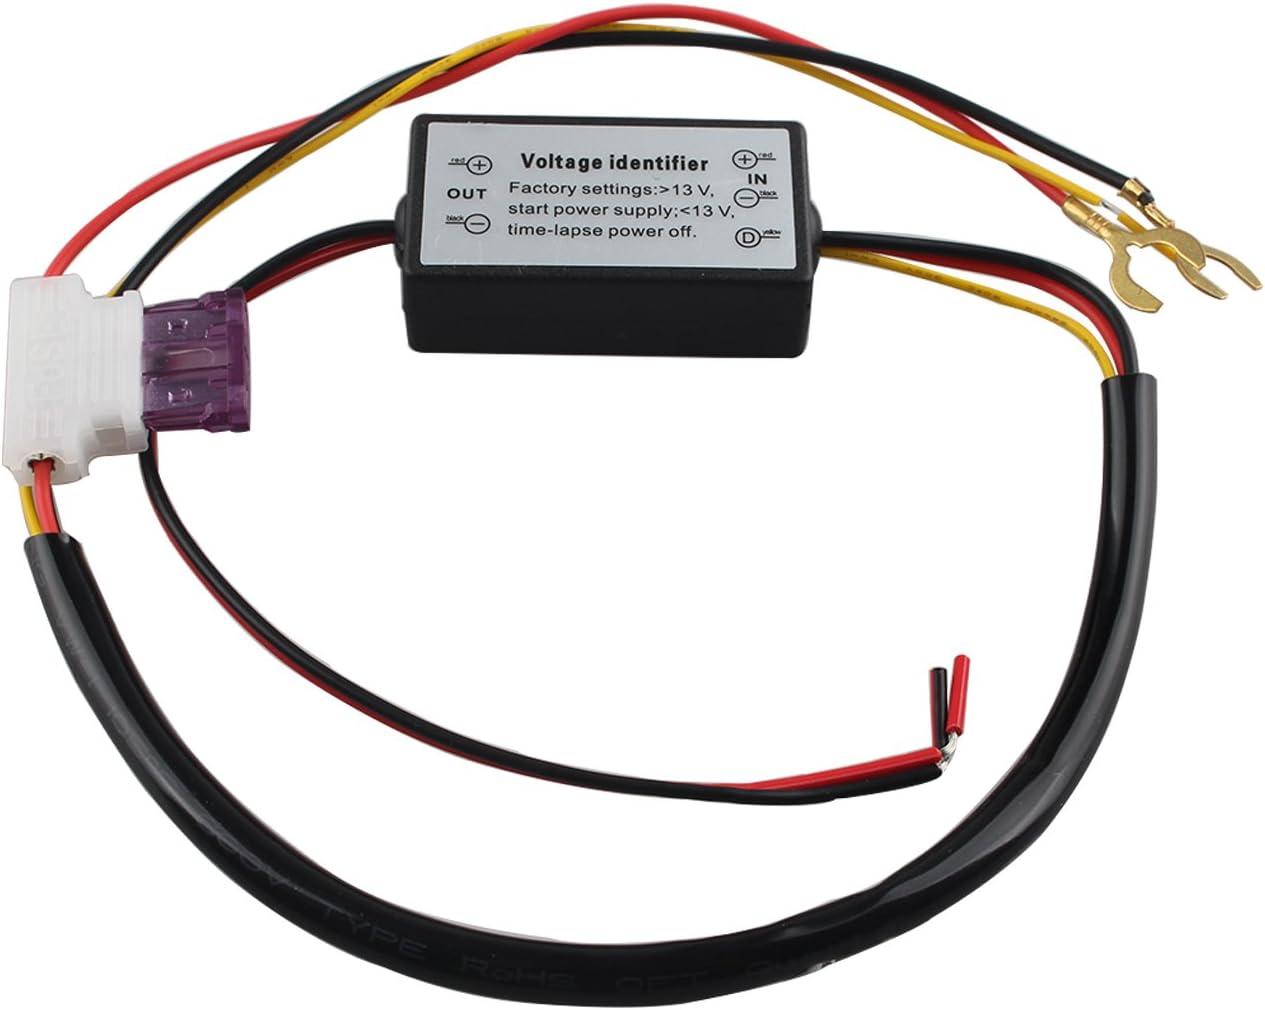 Controlador de luz Diurna LED para Coche DRL Auto On//Off Interruptor de Encendido//Apagado 12 V rel/é de luz regulador FUSD